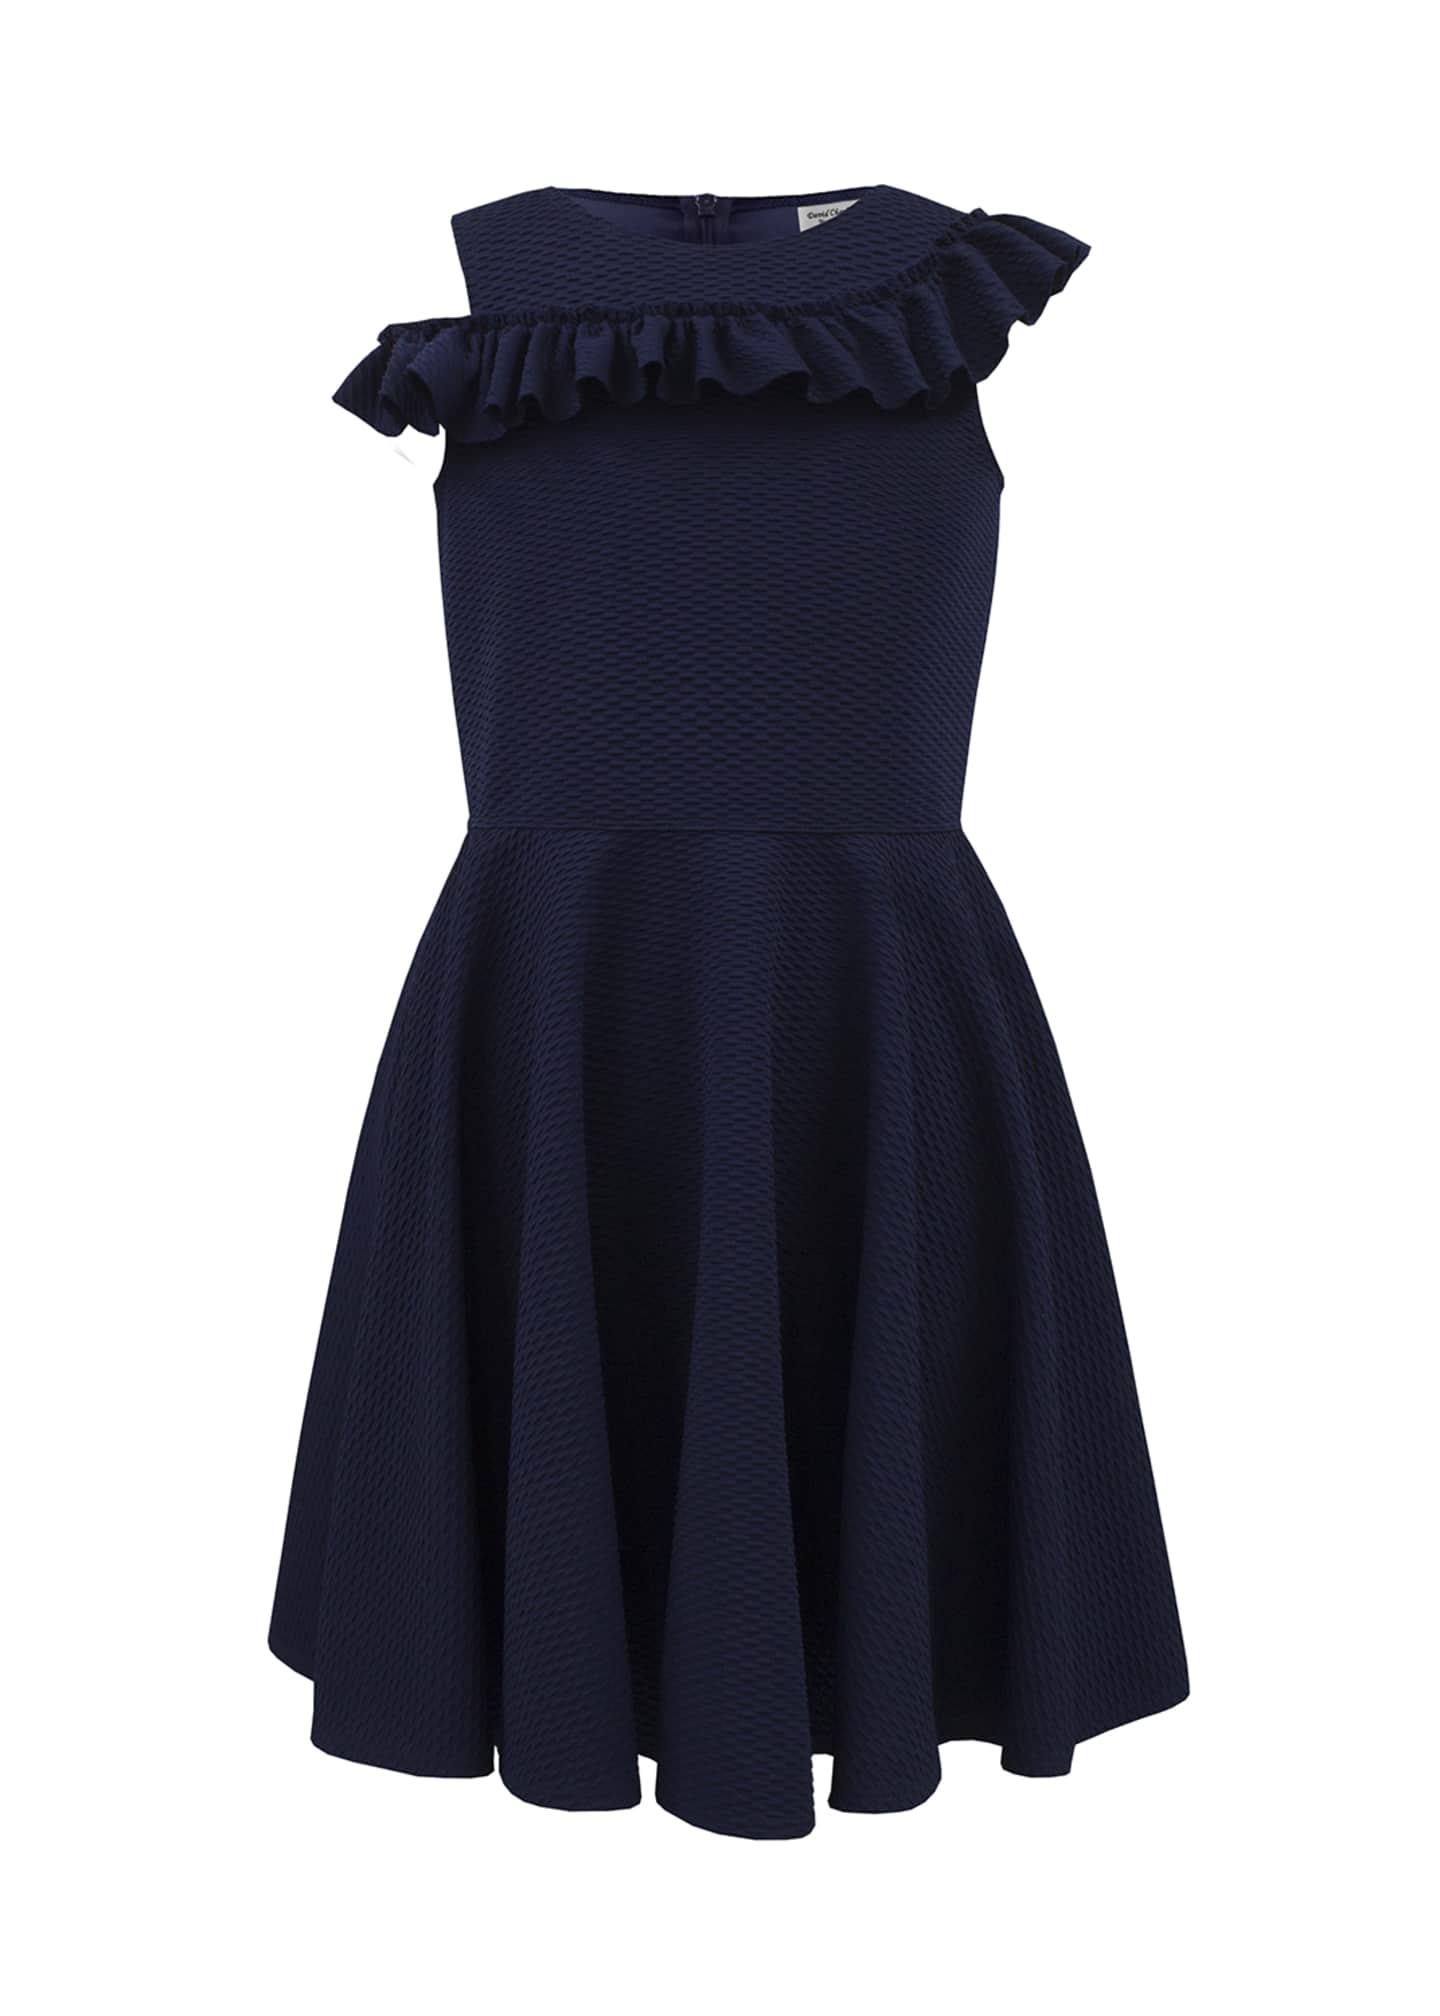 David Charles Asymmetric Ruffle One-Shoulder Knit Dress, Size